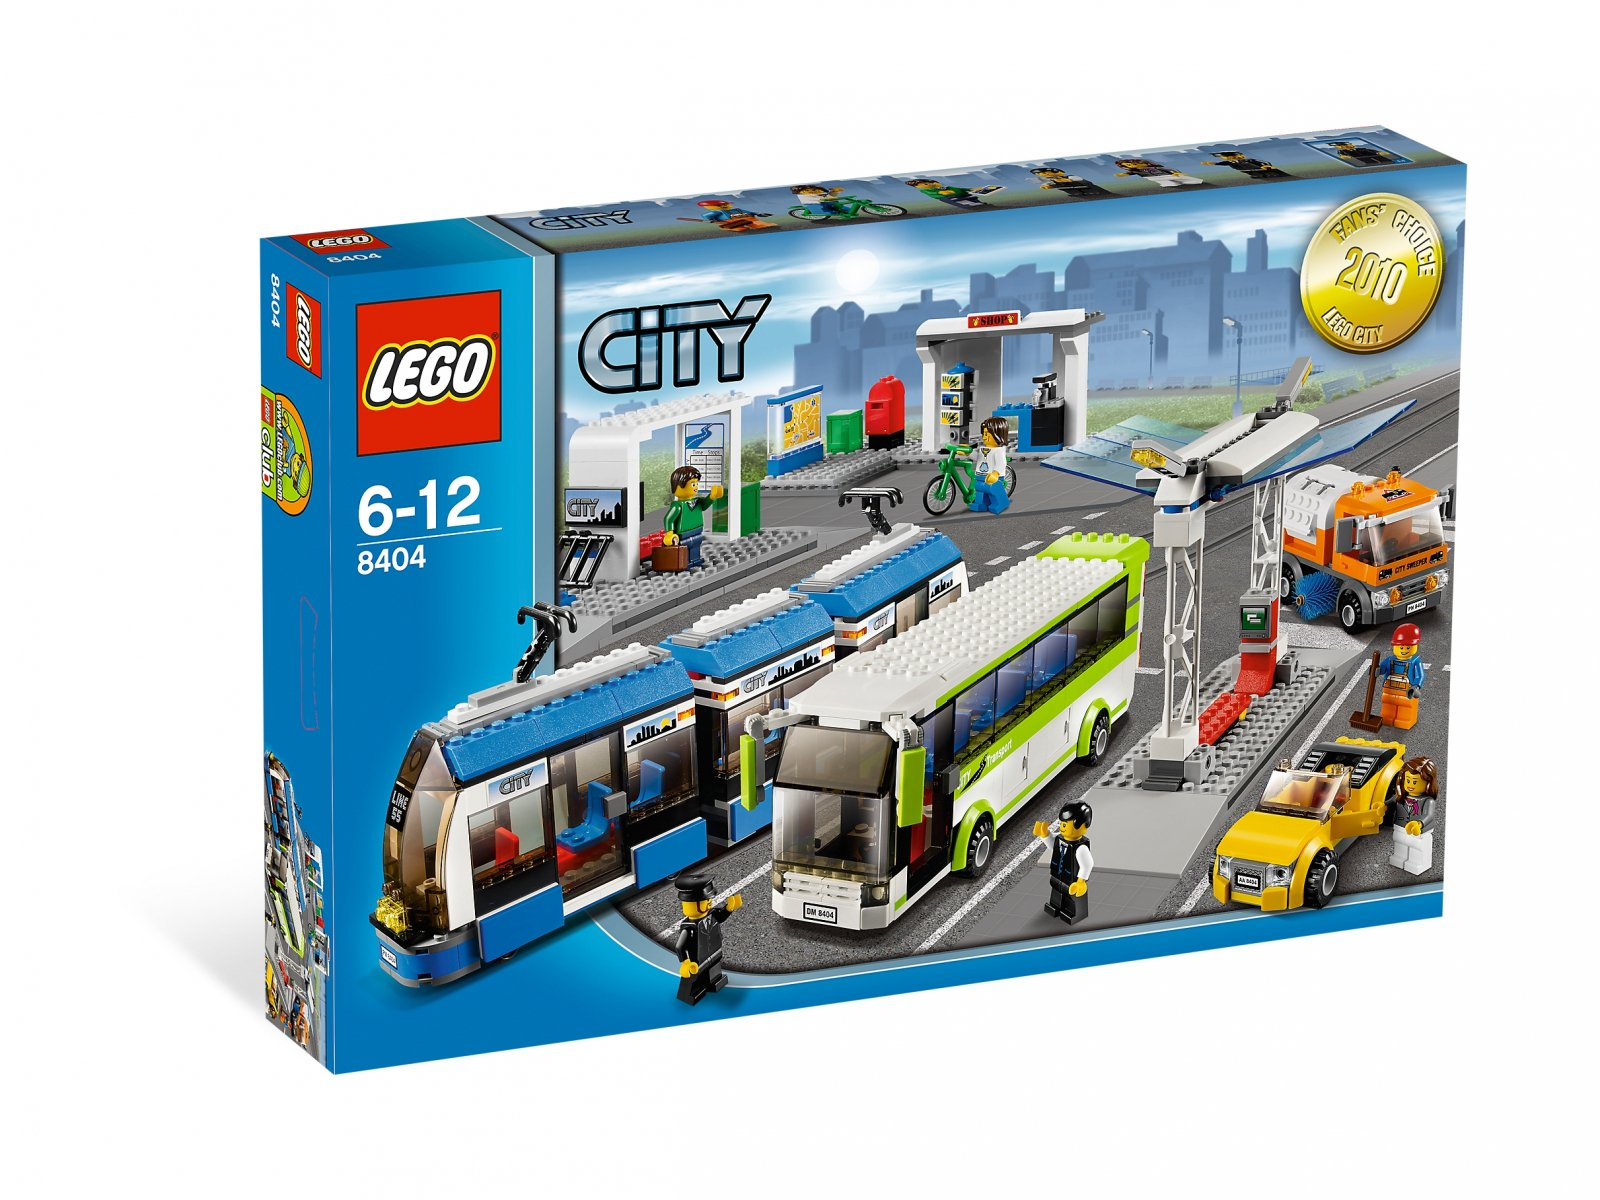 LEGO 8404 Public Transport